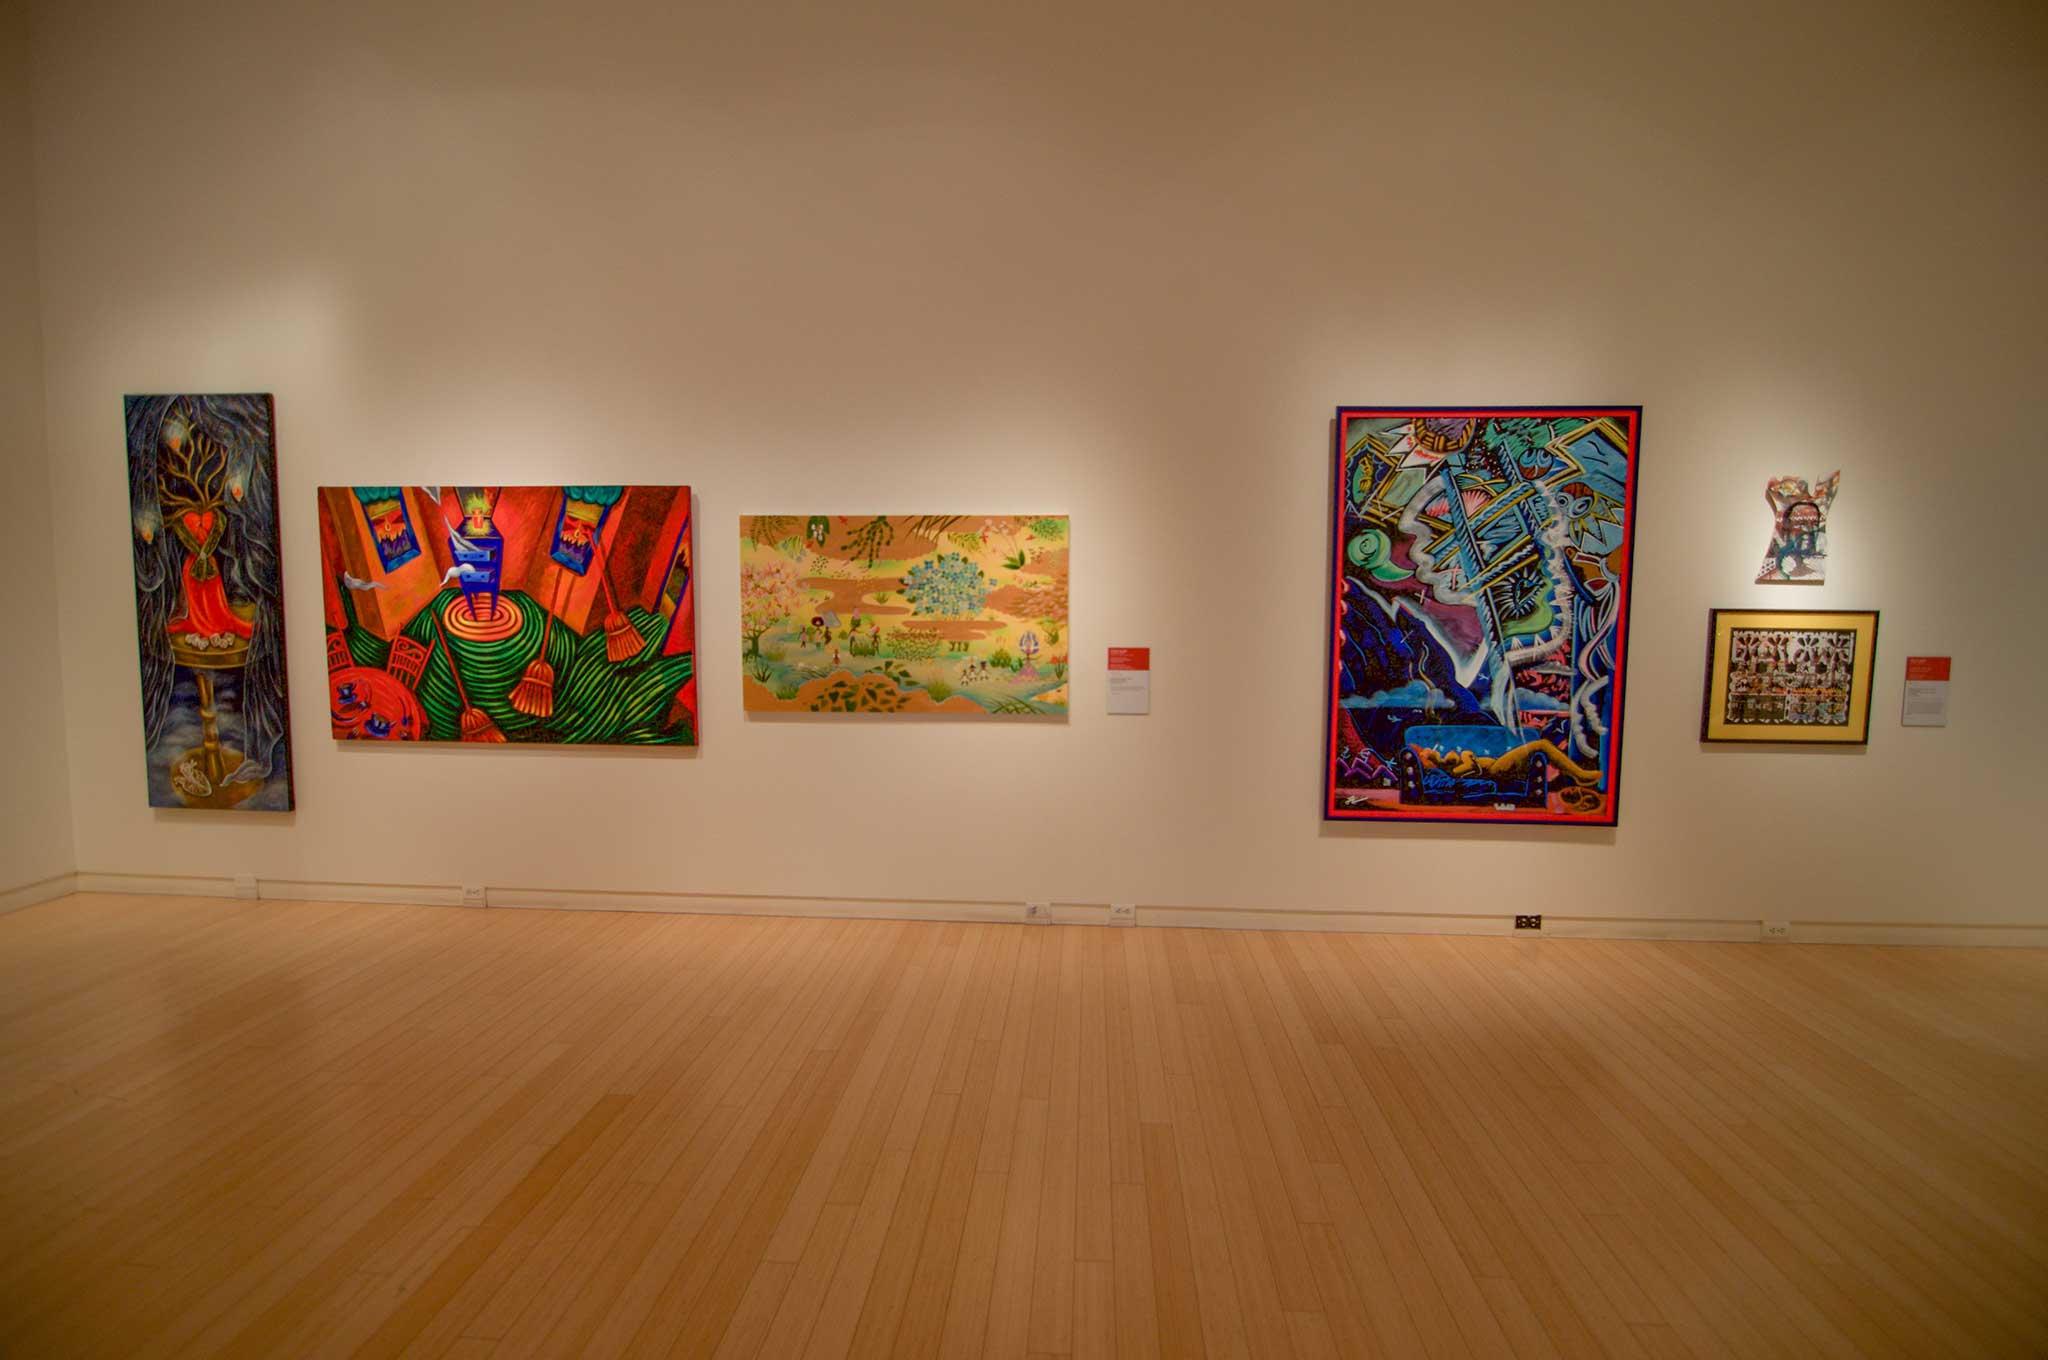 Cheech Marin S Art Collection Lowrider